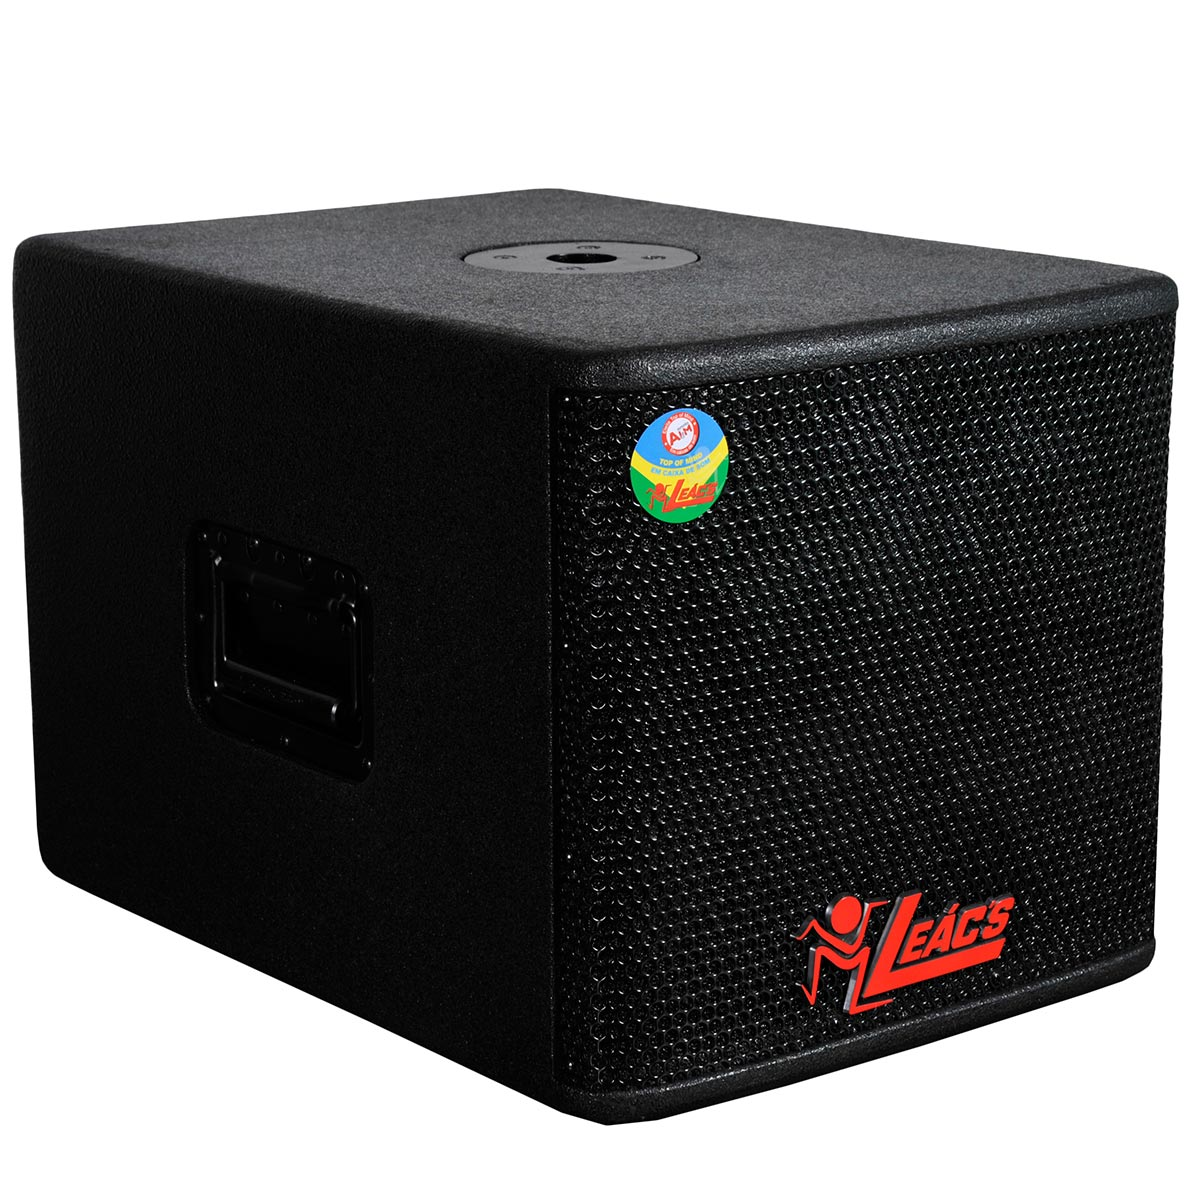 VIP300 - Subwoofer Passivo 150W VIP 300 - Leacs